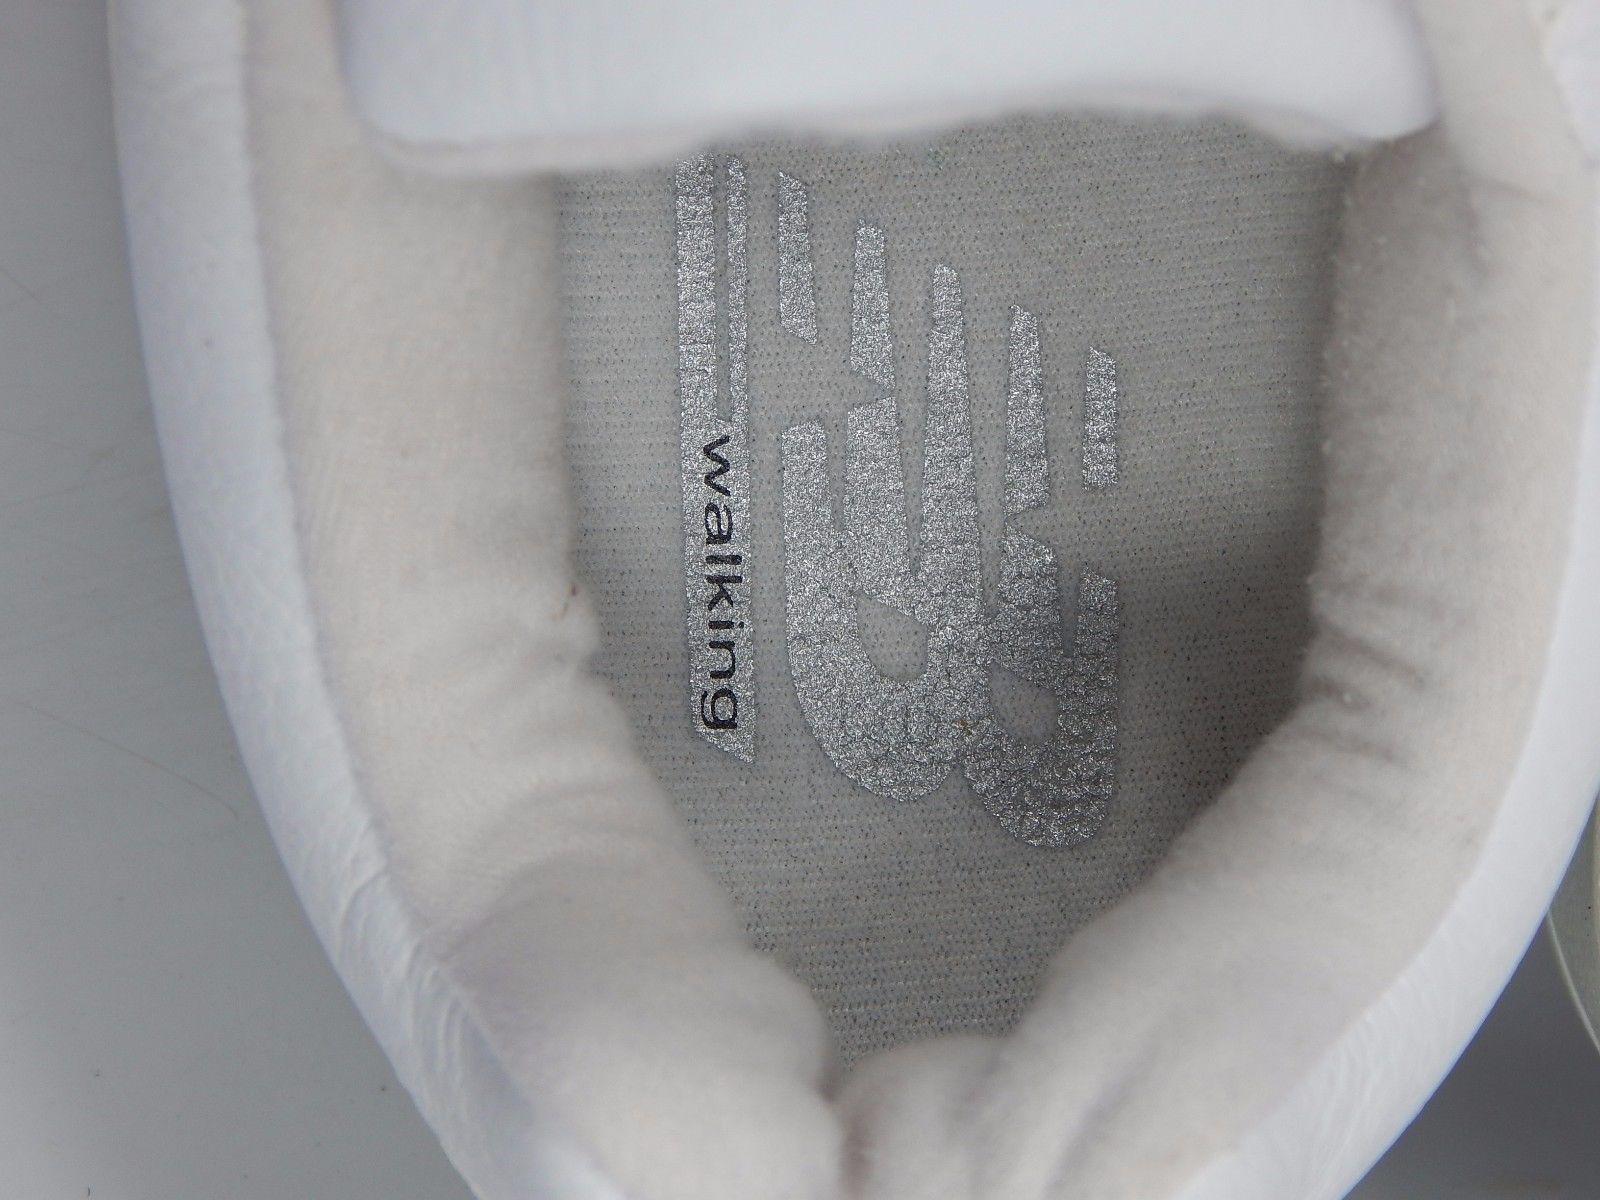 New Balance 812 Men's Walking Shoes Size 8 4E EXTRA WIDE EU 41.5 White MW812VW